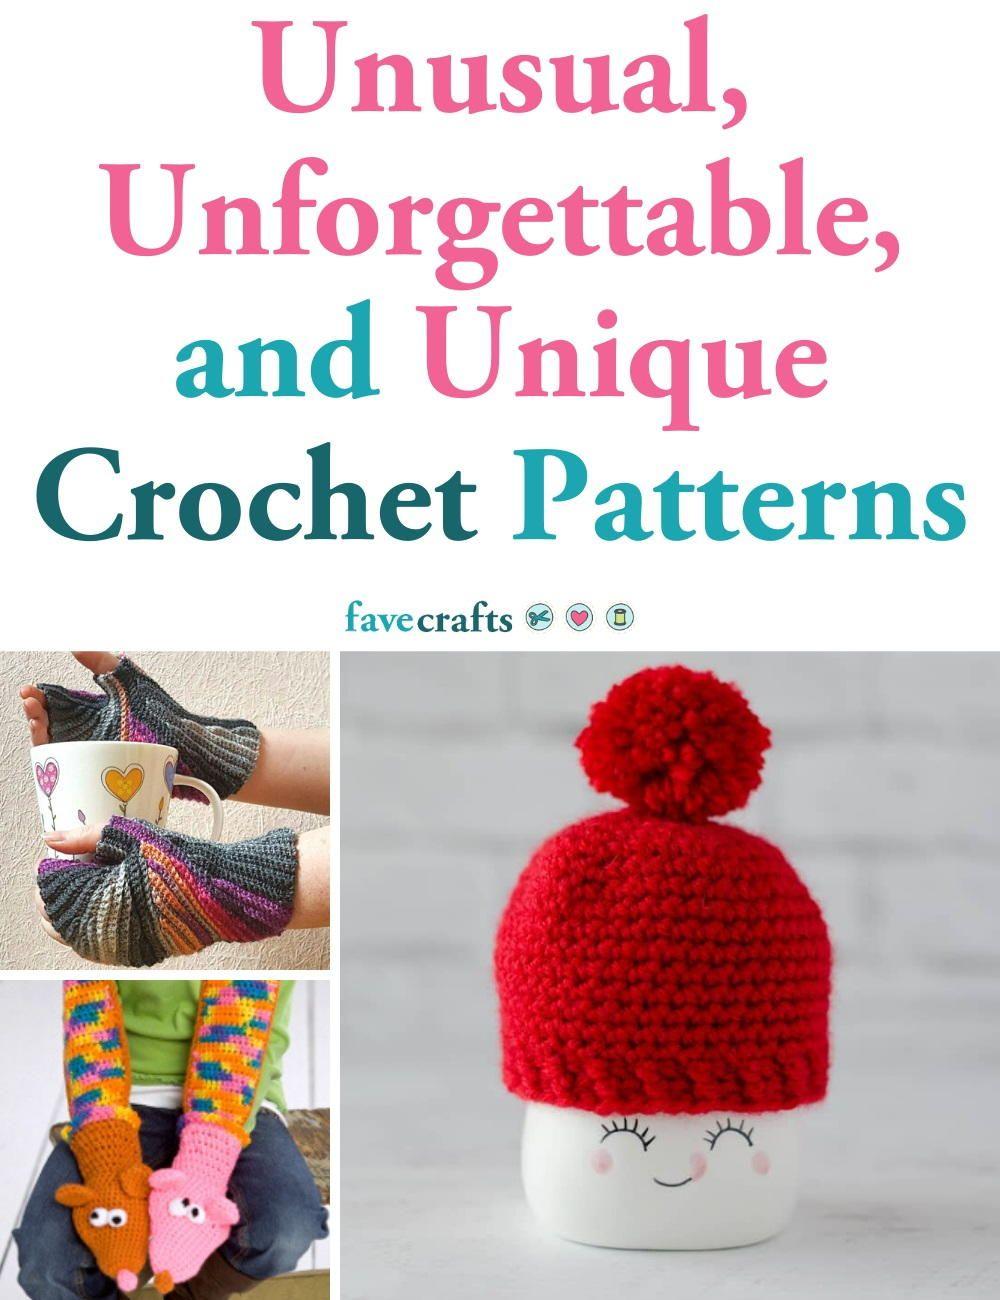 35 Unusual, Unforgettable, and Unique Crochet Patterns ...